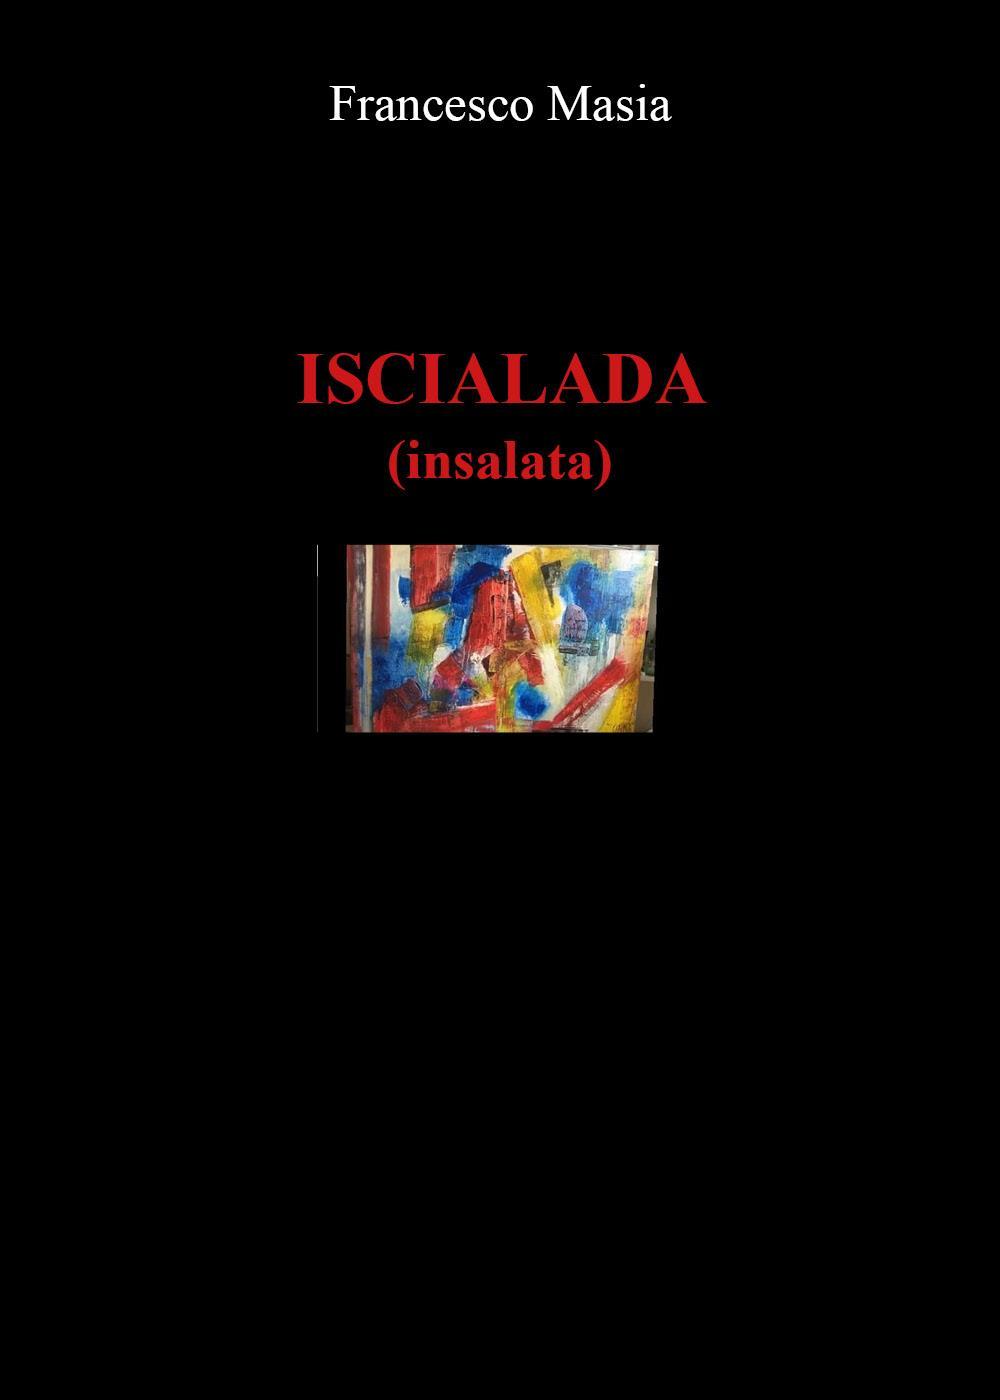 Iscialada - Insalata